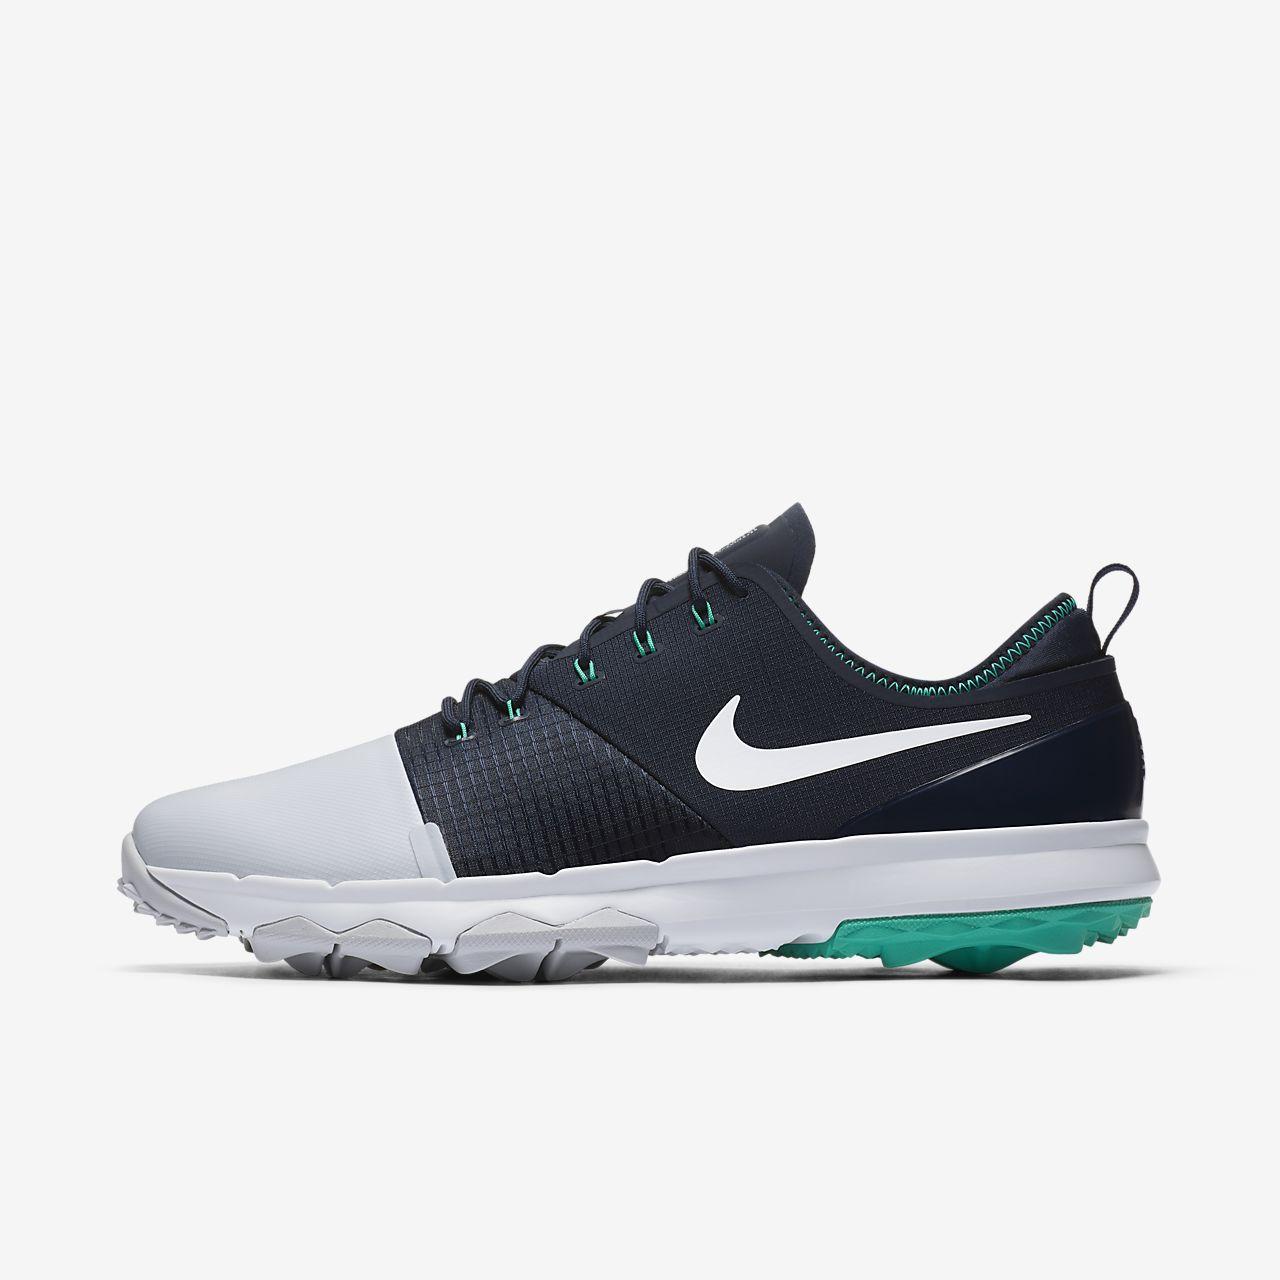 eab159f3119a Nike FI Impact 3 Men s Golf Shoe. Nike.com BE